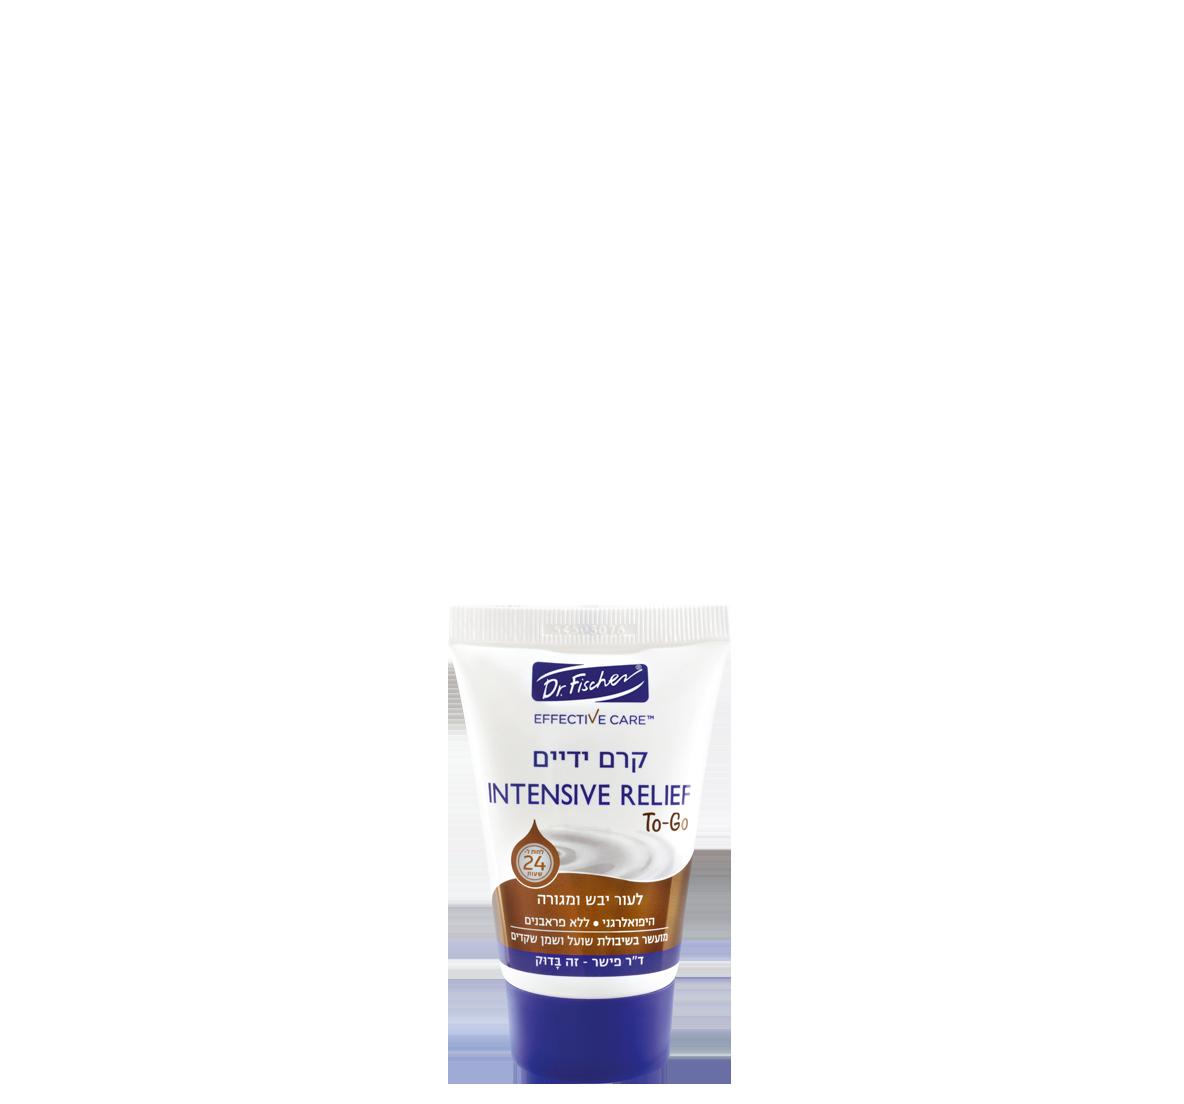 effective-care_relief-50ml-hand-cream_1184x1104